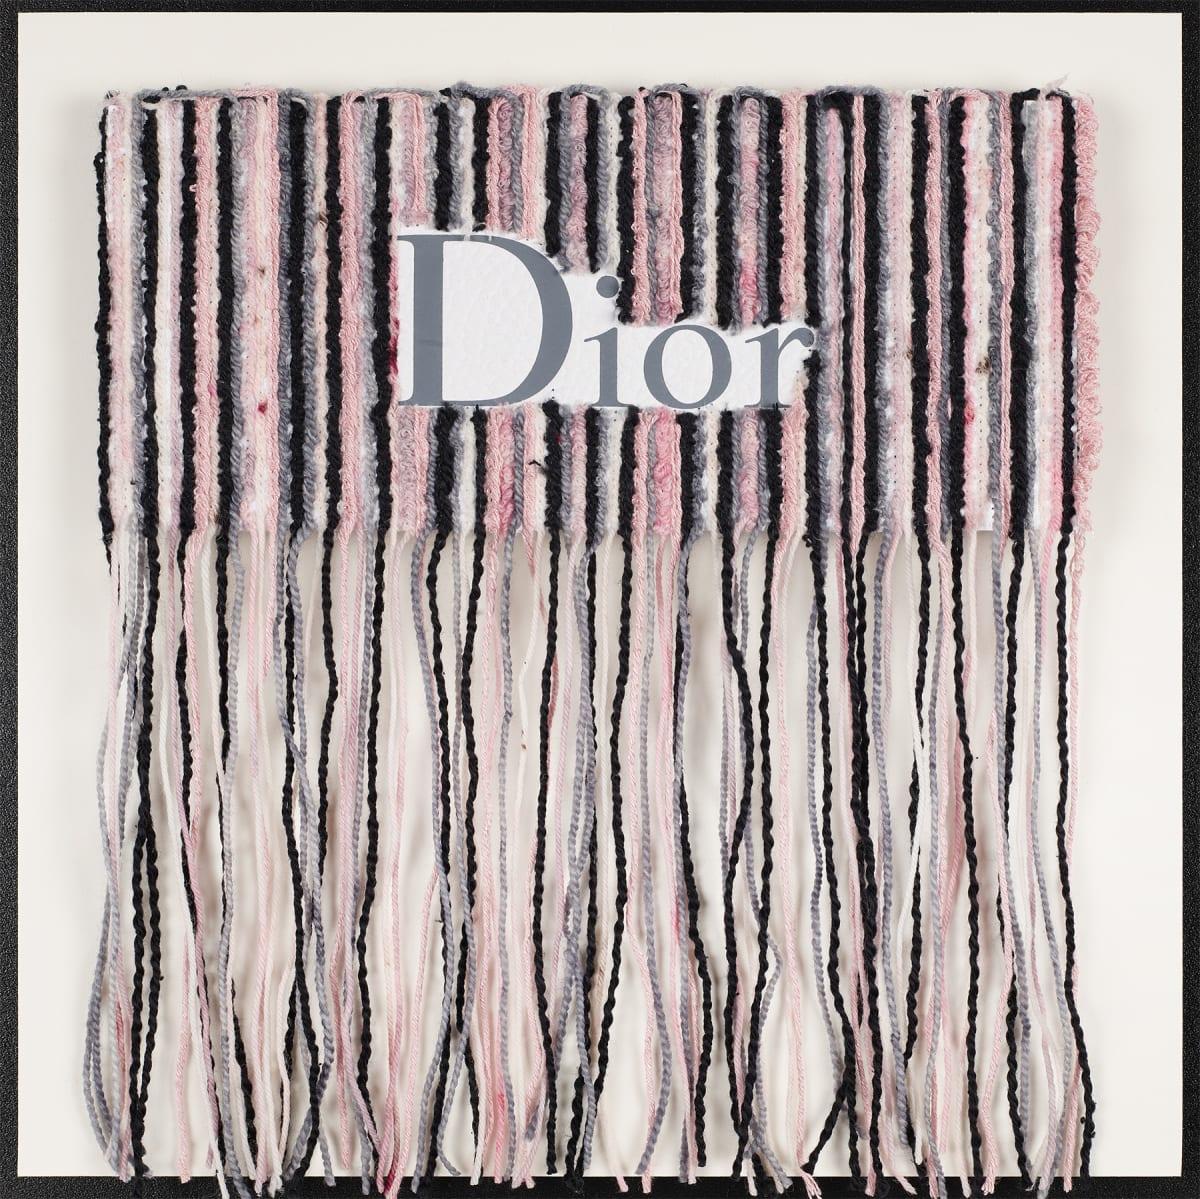 Stephen Wilson, Dior Yarn Drip Study II, 2019